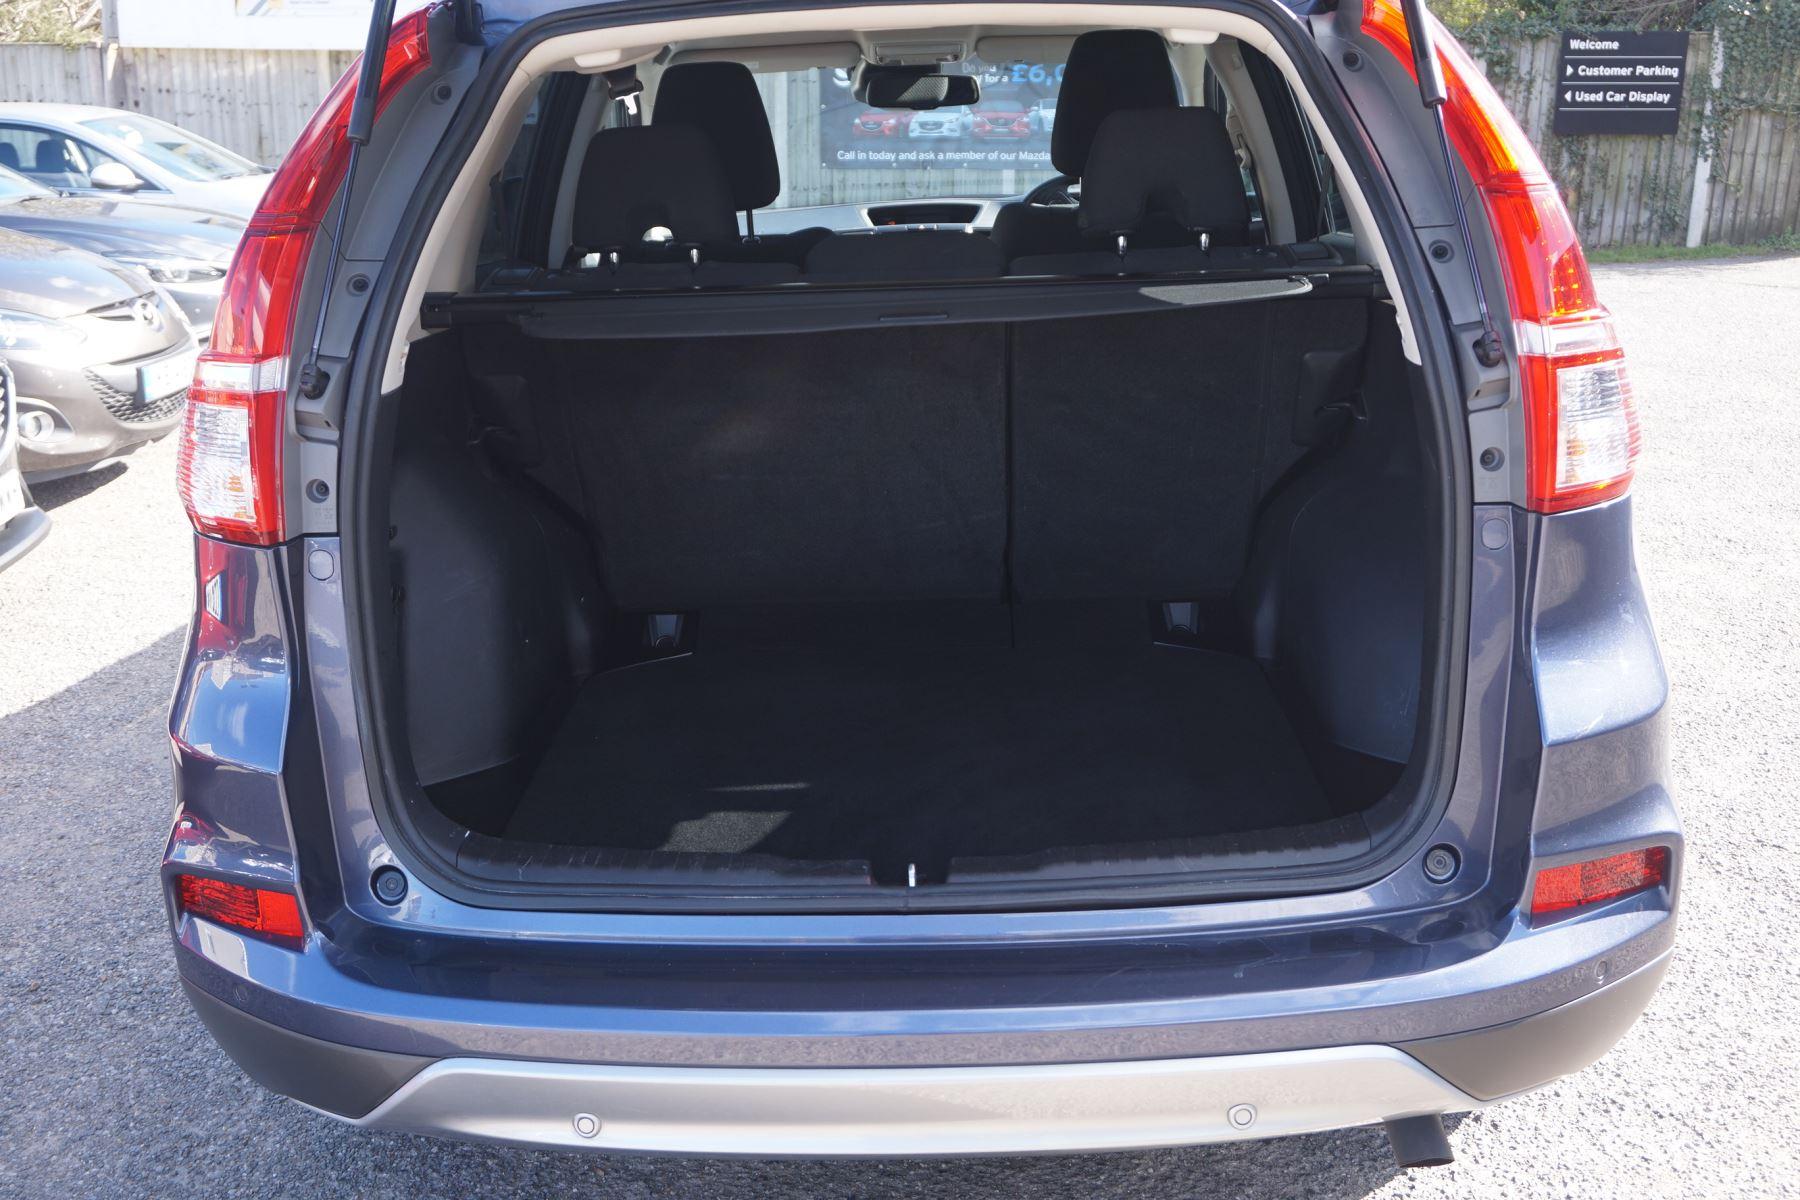 Honda CR-V 1.6 i-DTEC 160 SE Plus 5dr [Nav] 4WD image 6